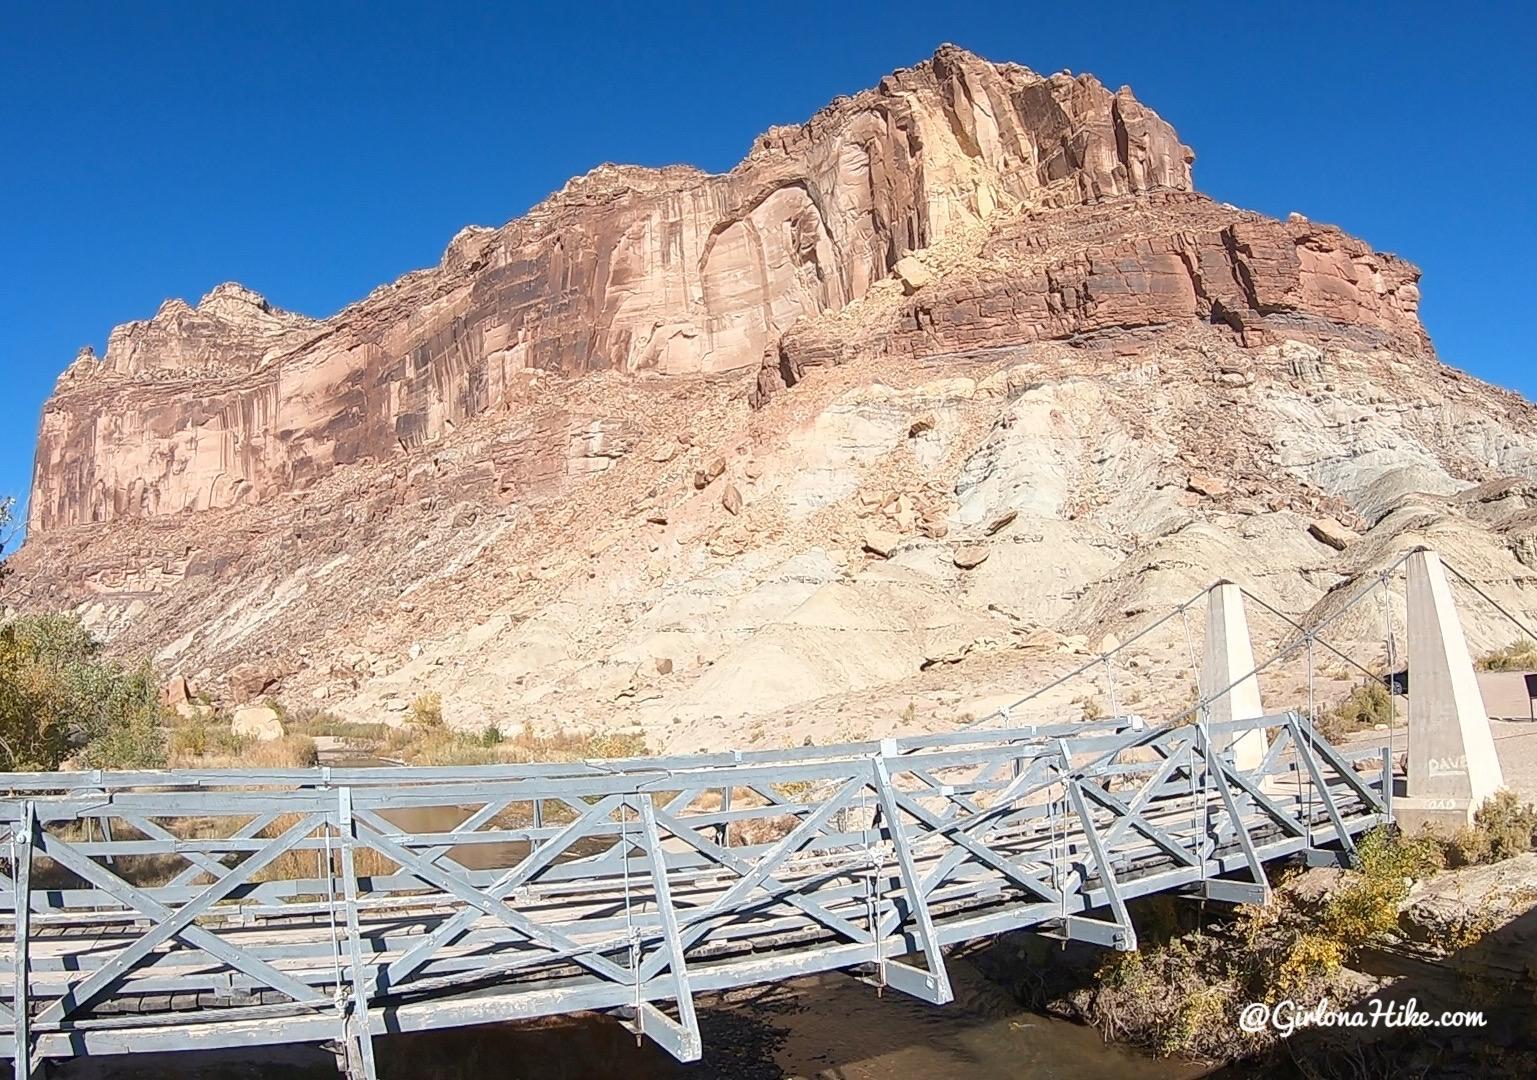 Camping & Exploring The Wedge Overlook, San Rafael Suspension Bridge